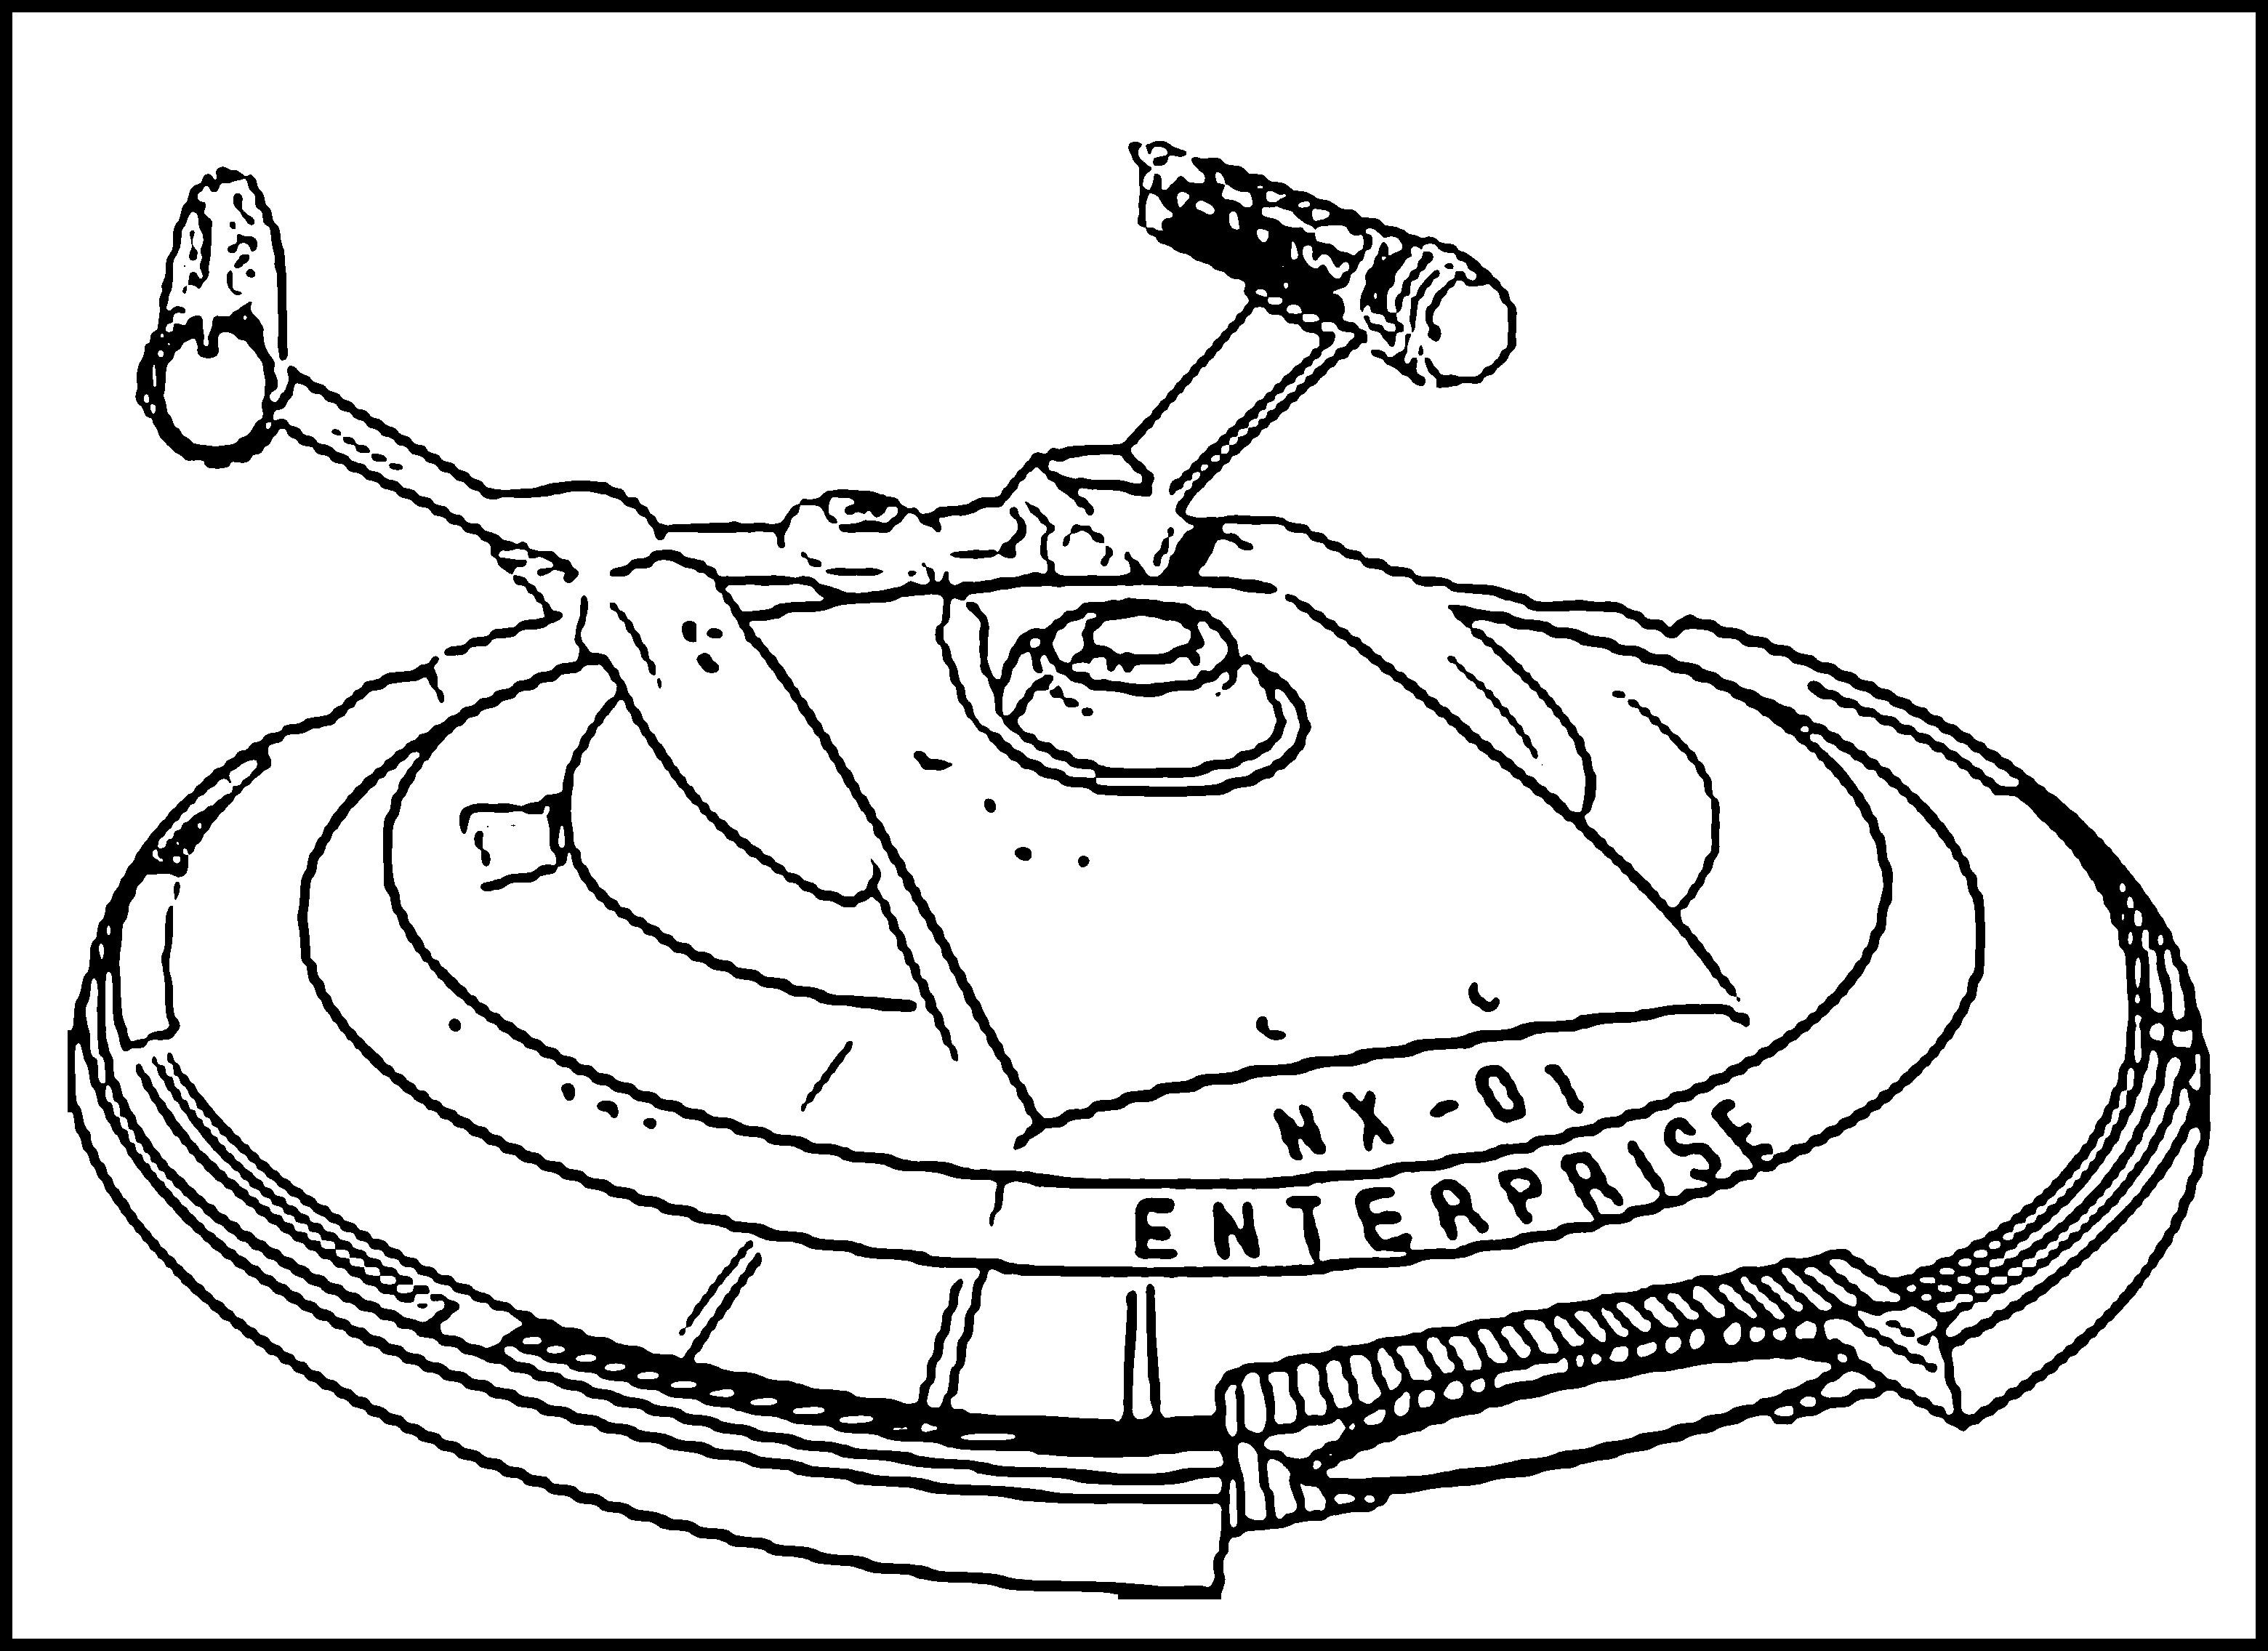 3120x2271 Space Rocket Coloring Pages For Kids Elegant Drawn Spaceship Alien